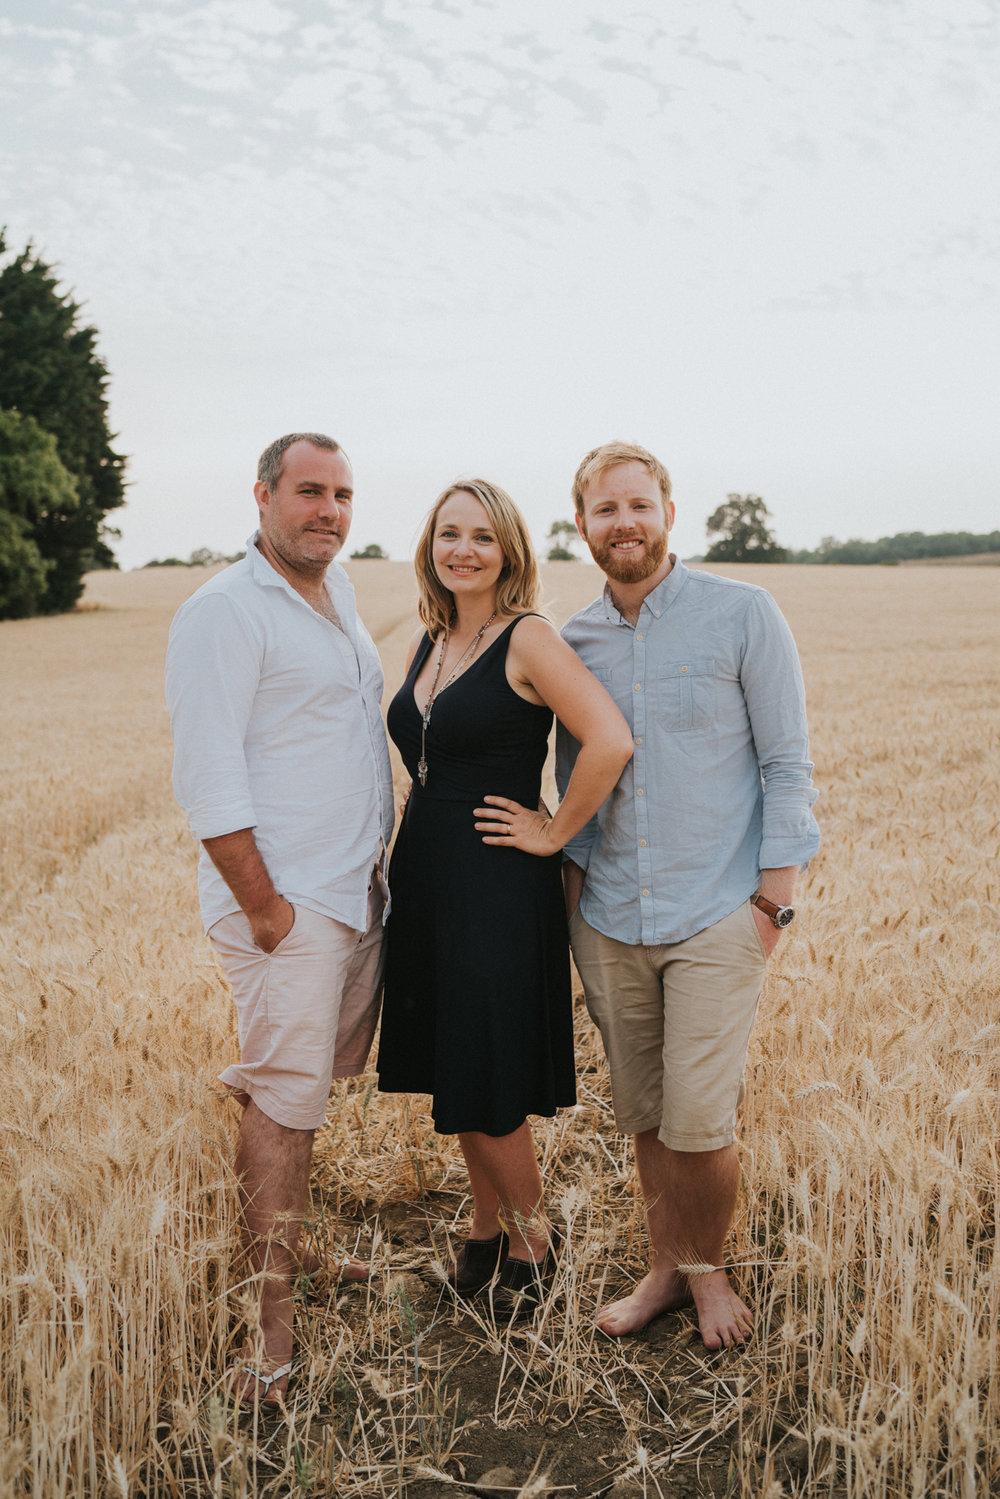 Parkers-Extended-Family-Session-Grace-Elizabeth-Alternative-Wedding-Lifestyle-Photographer-Colchester-Essex-Norfolk-Suffolk-Devon (61 of 62).jpg